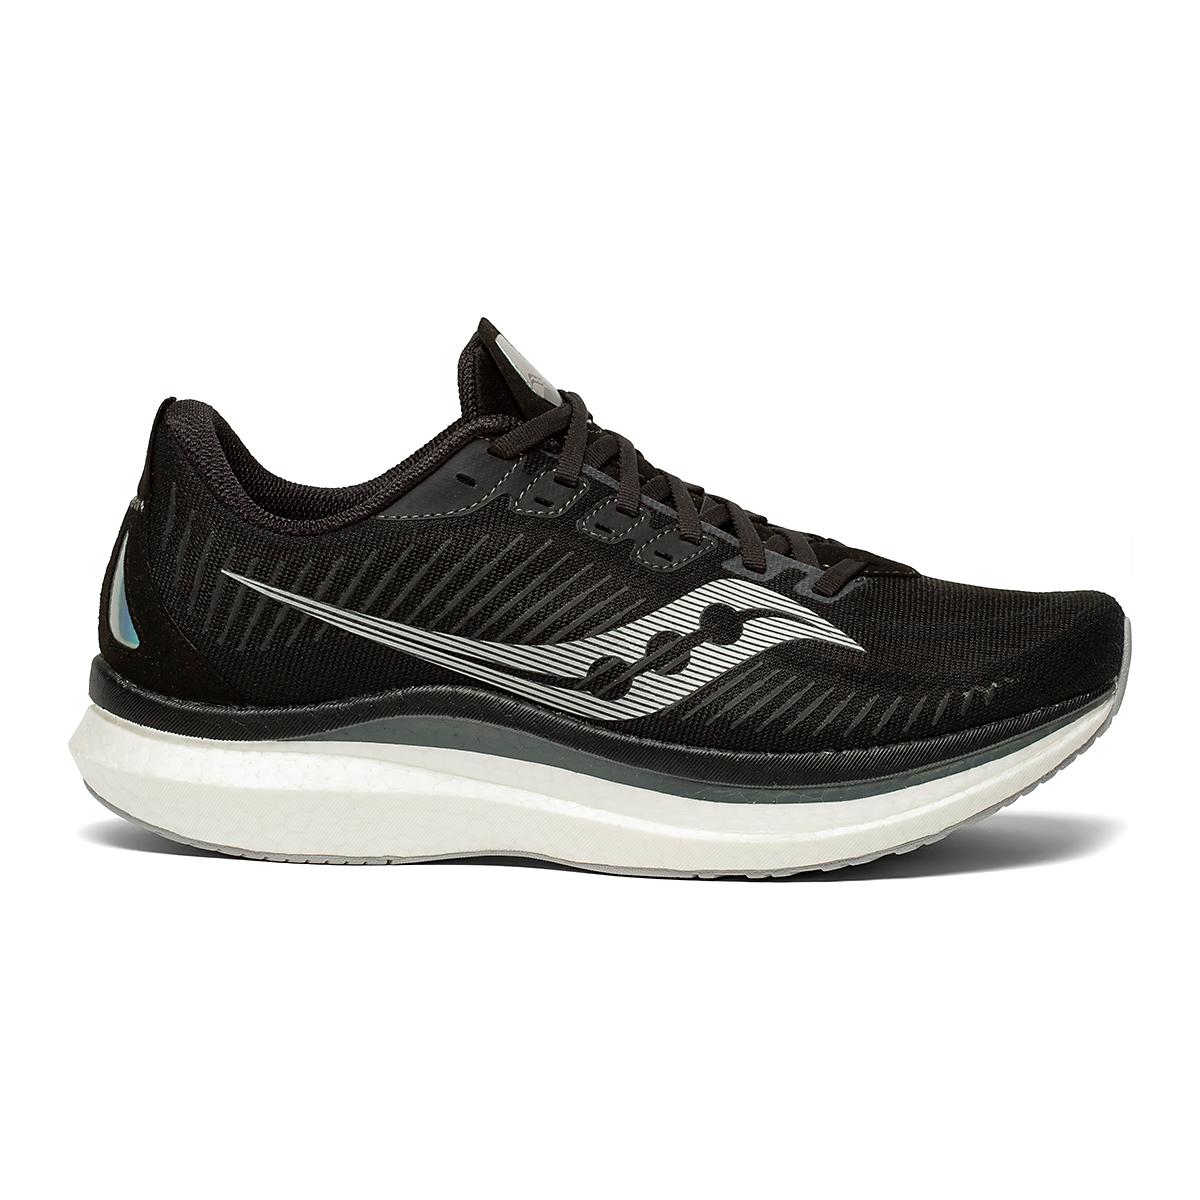 Men's Saucony Endorphin Speed 2 Running Shoe - Color: Black/Shadow - Size: 7 - Width: Regular, Black/Shadow, large, image 1